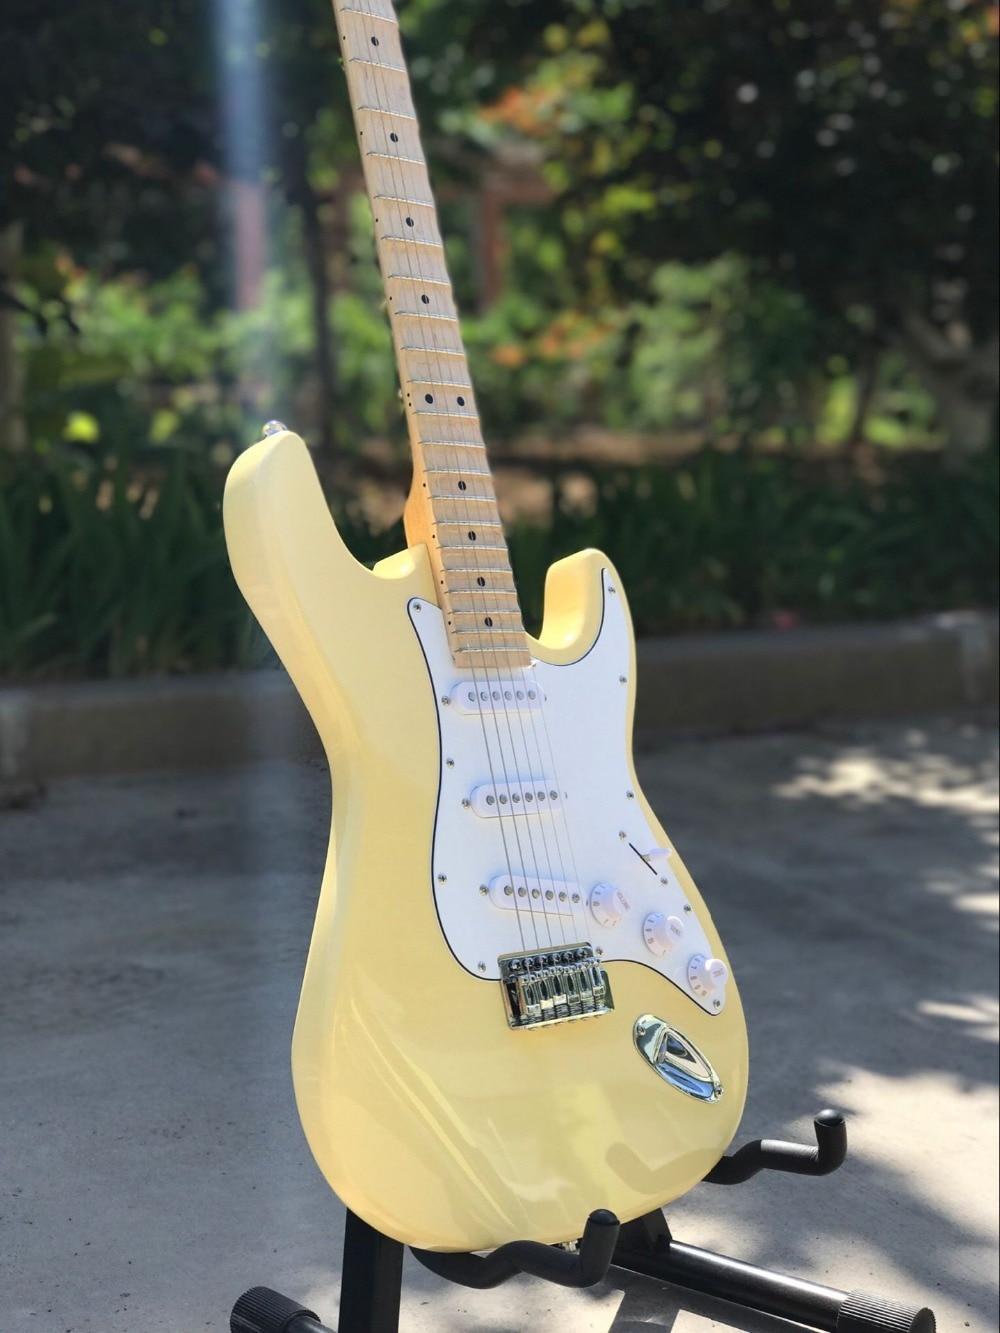 buy custom shop top quality st electric guitar handwork 6 strings maple. Black Bedroom Furniture Sets. Home Design Ideas